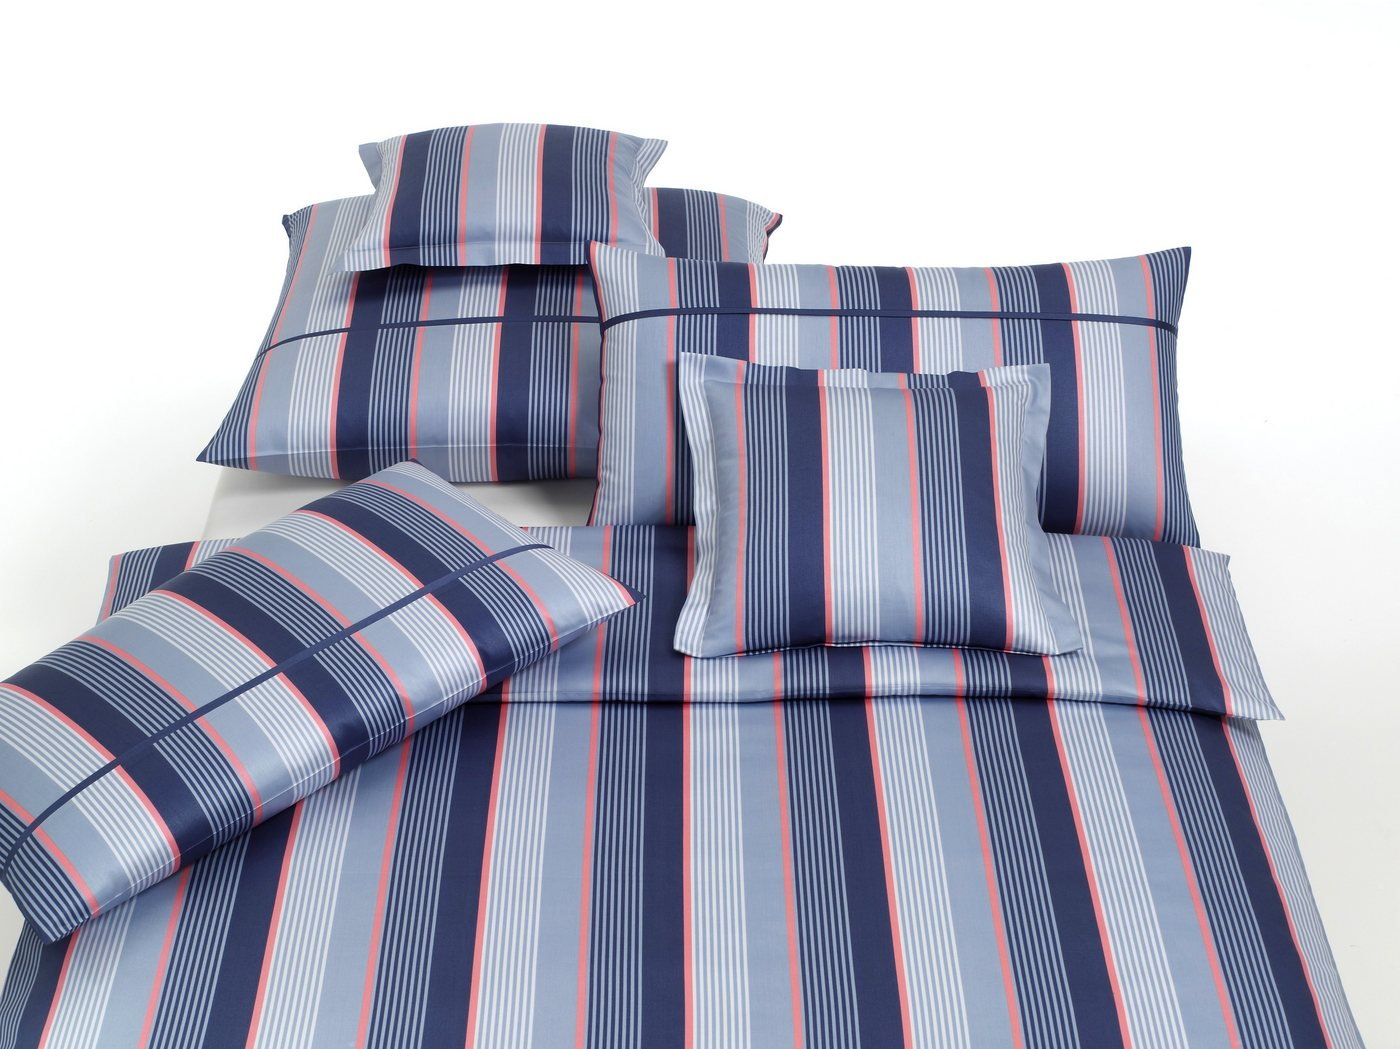 miele side by side preisvergleiche erfahrungsberichte. Black Bedroom Furniture Sets. Home Design Ideas